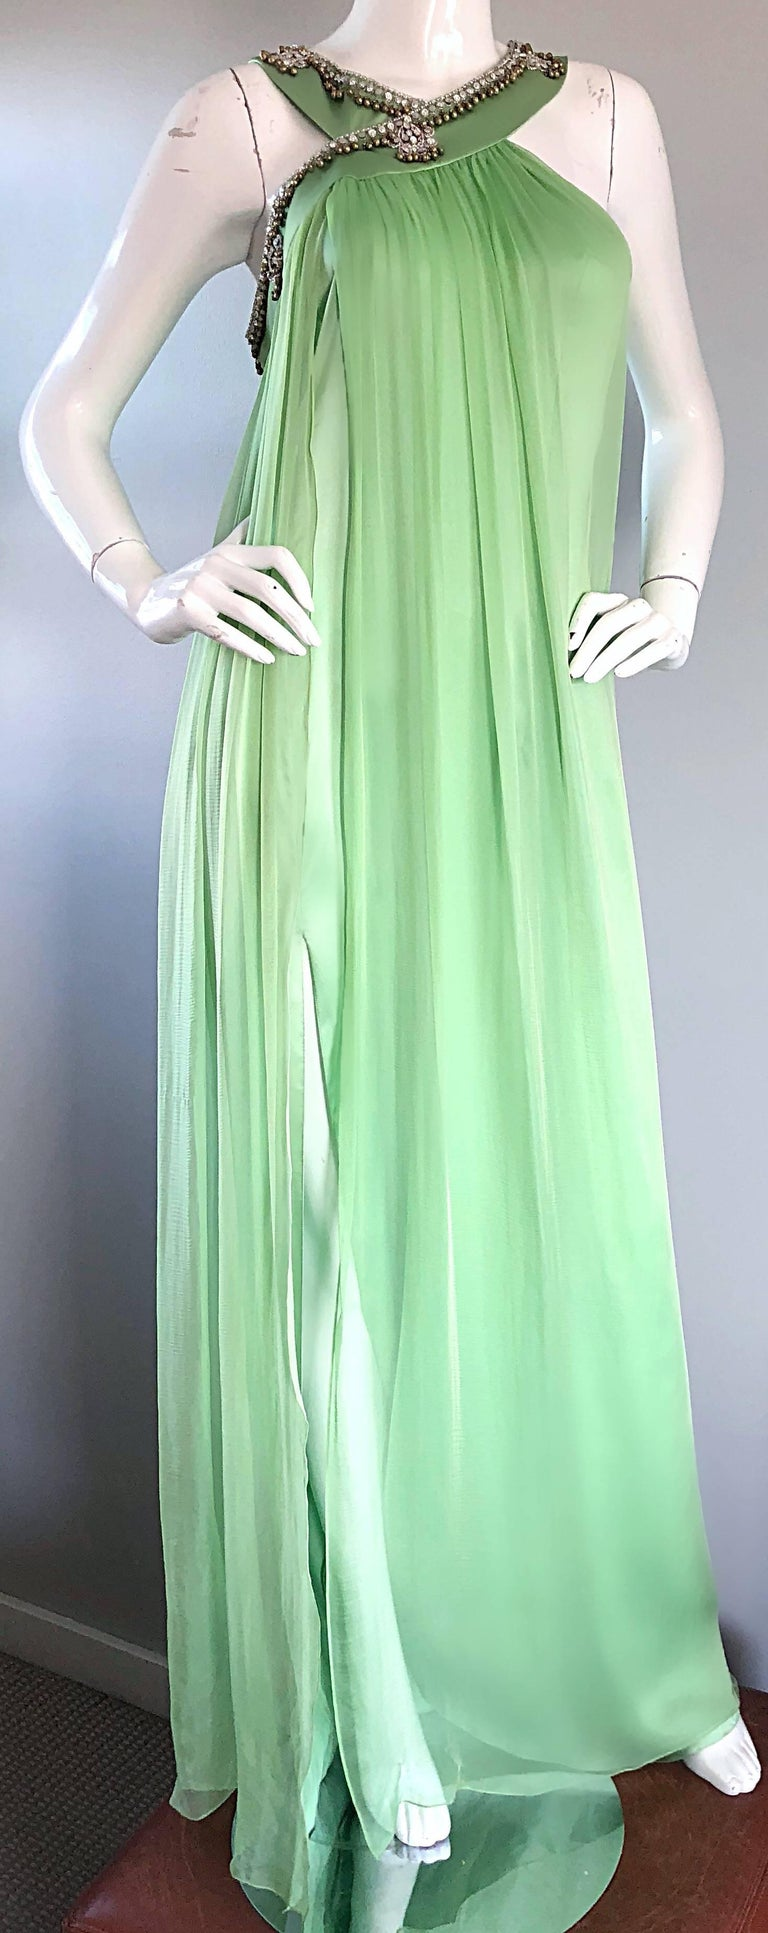 New Christian Dior John Galliano Light Green Silk Chiffon Grecian Gown, Sz 10   For Sale 3